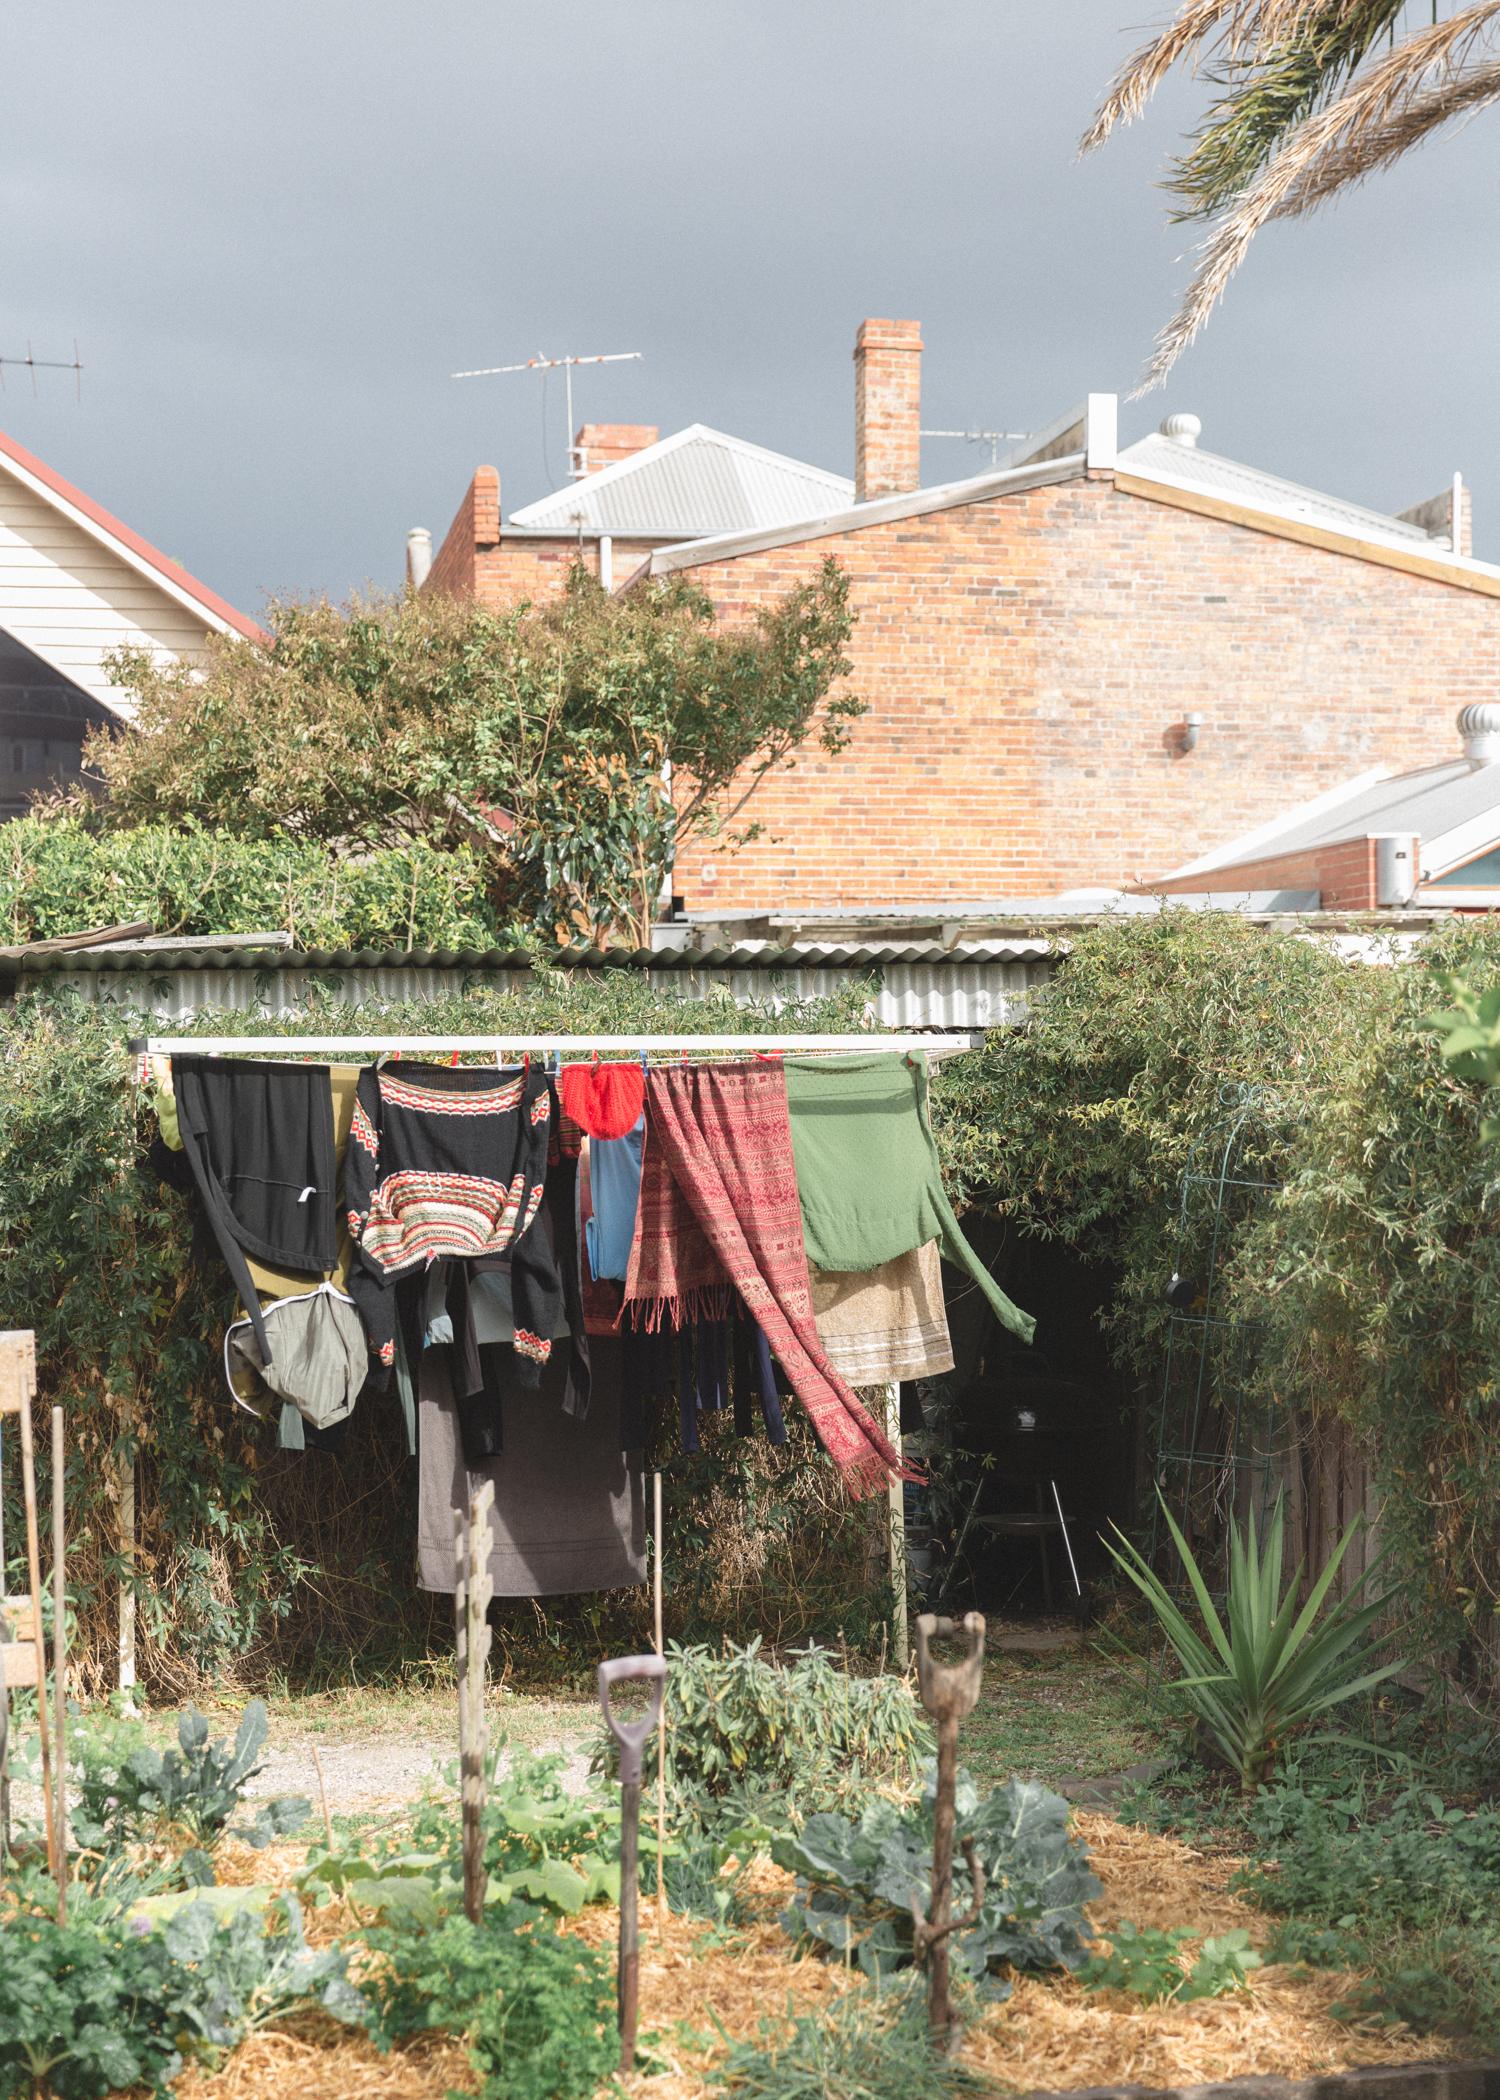 washing hills hoist clothes line backyard